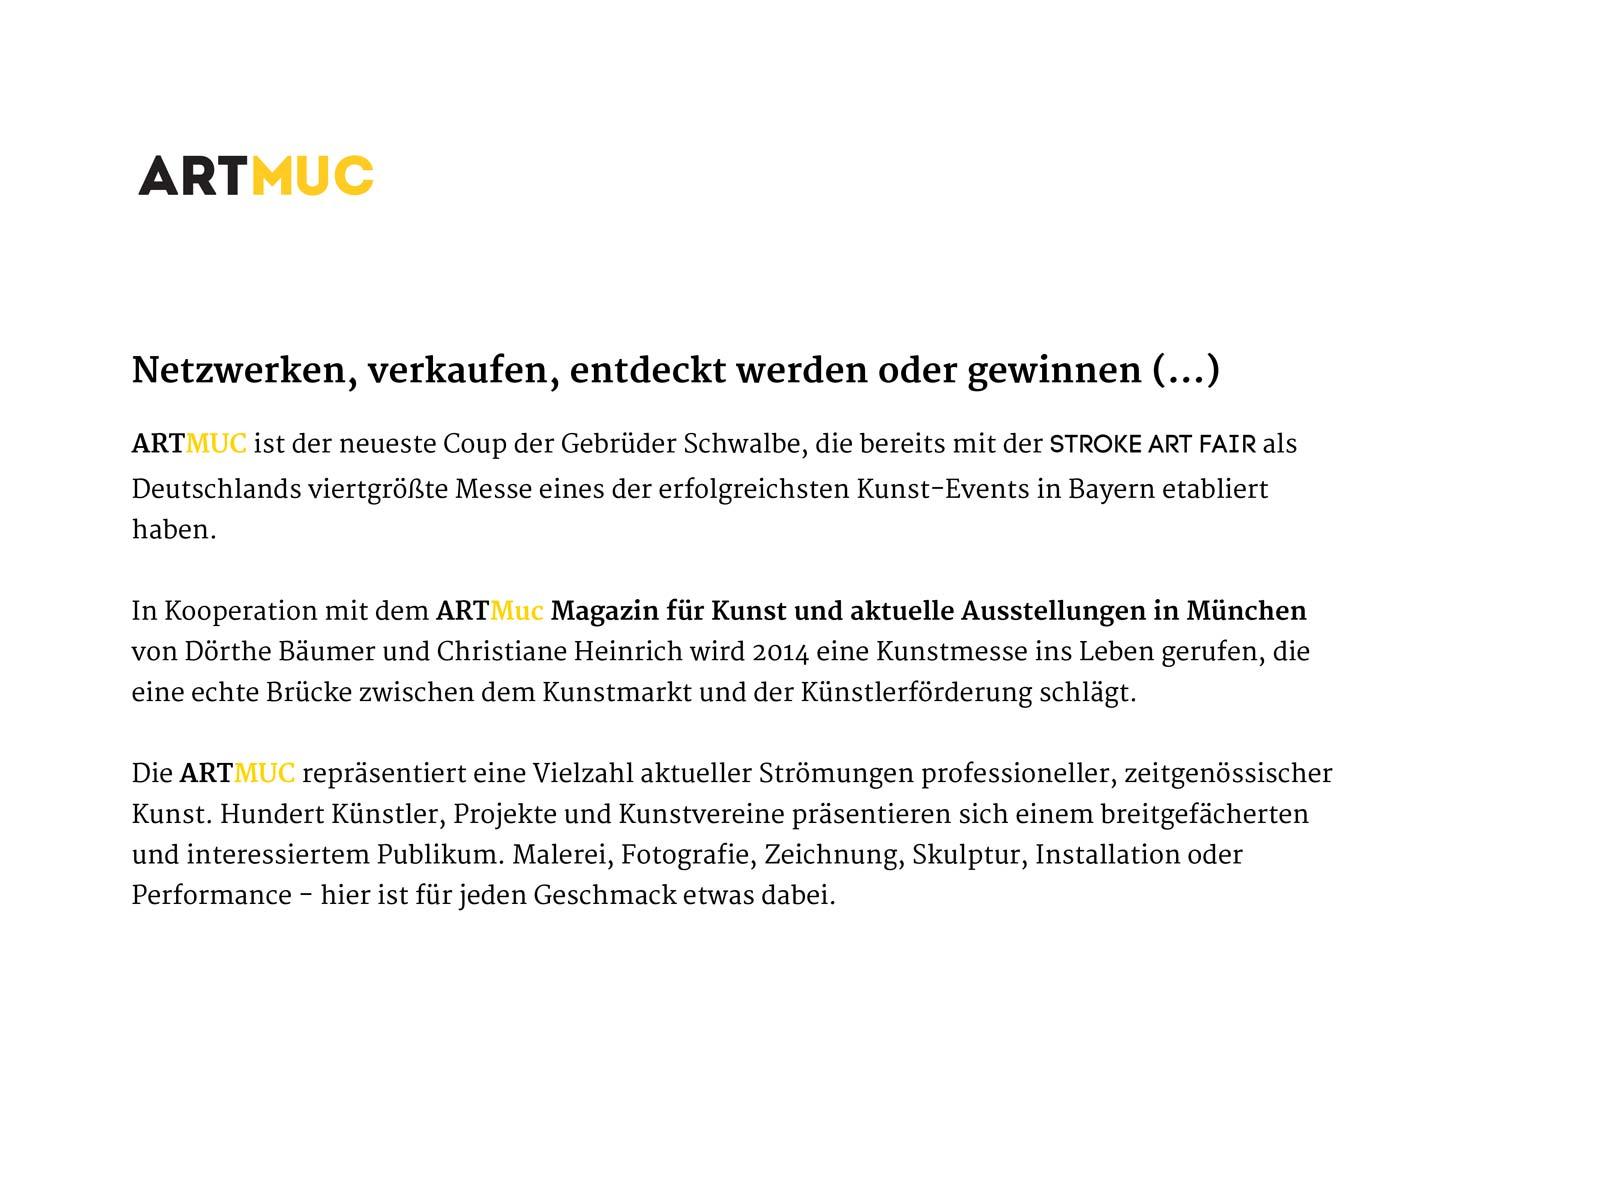 artmuc2014proposal